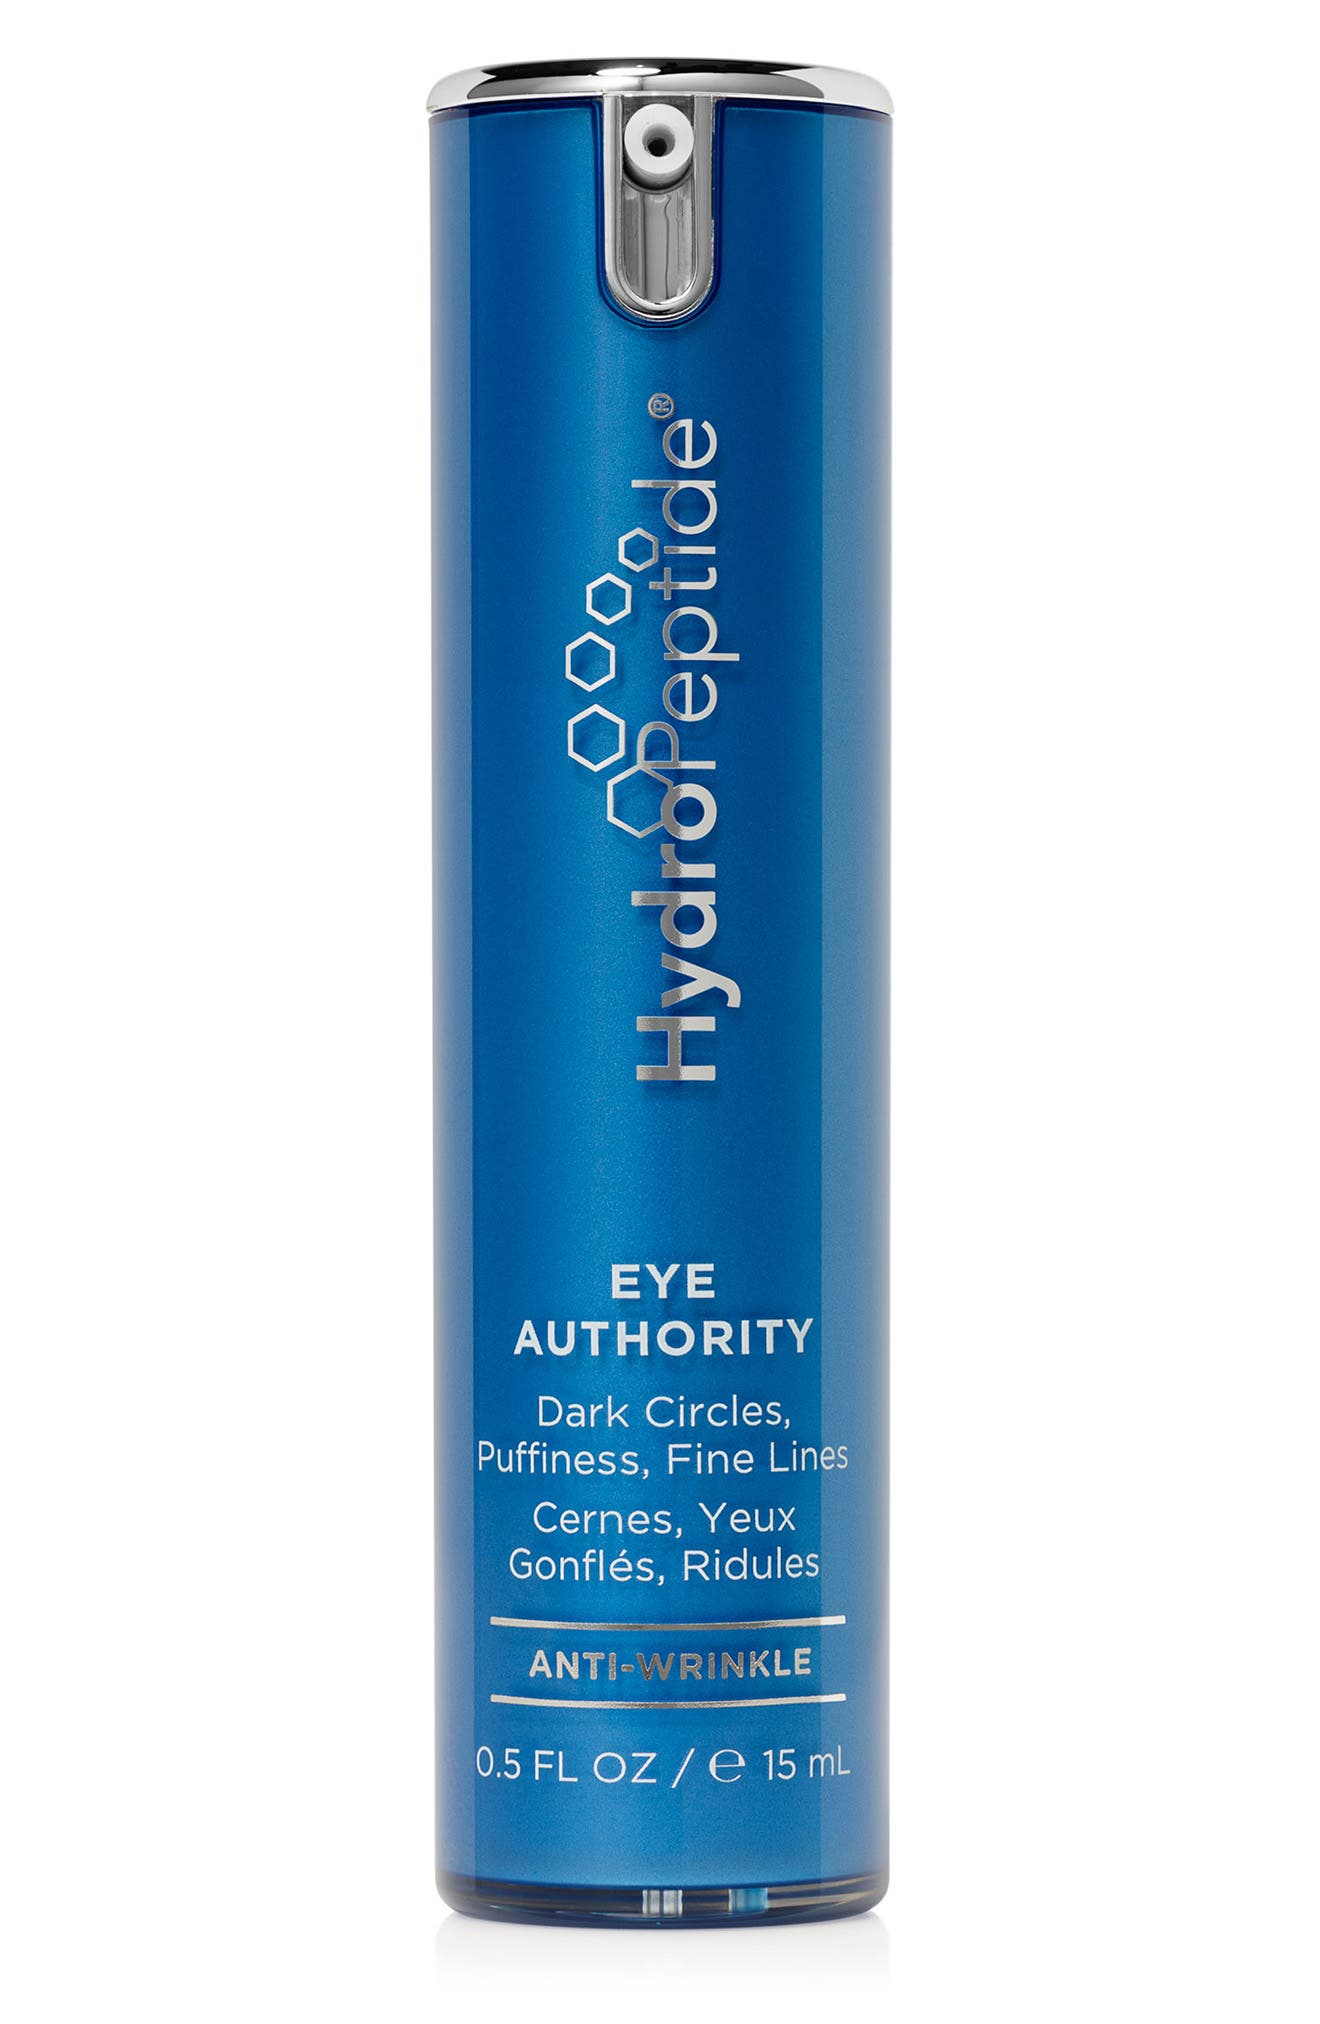 'Eye Authority' Anti-Wrinkle Cream